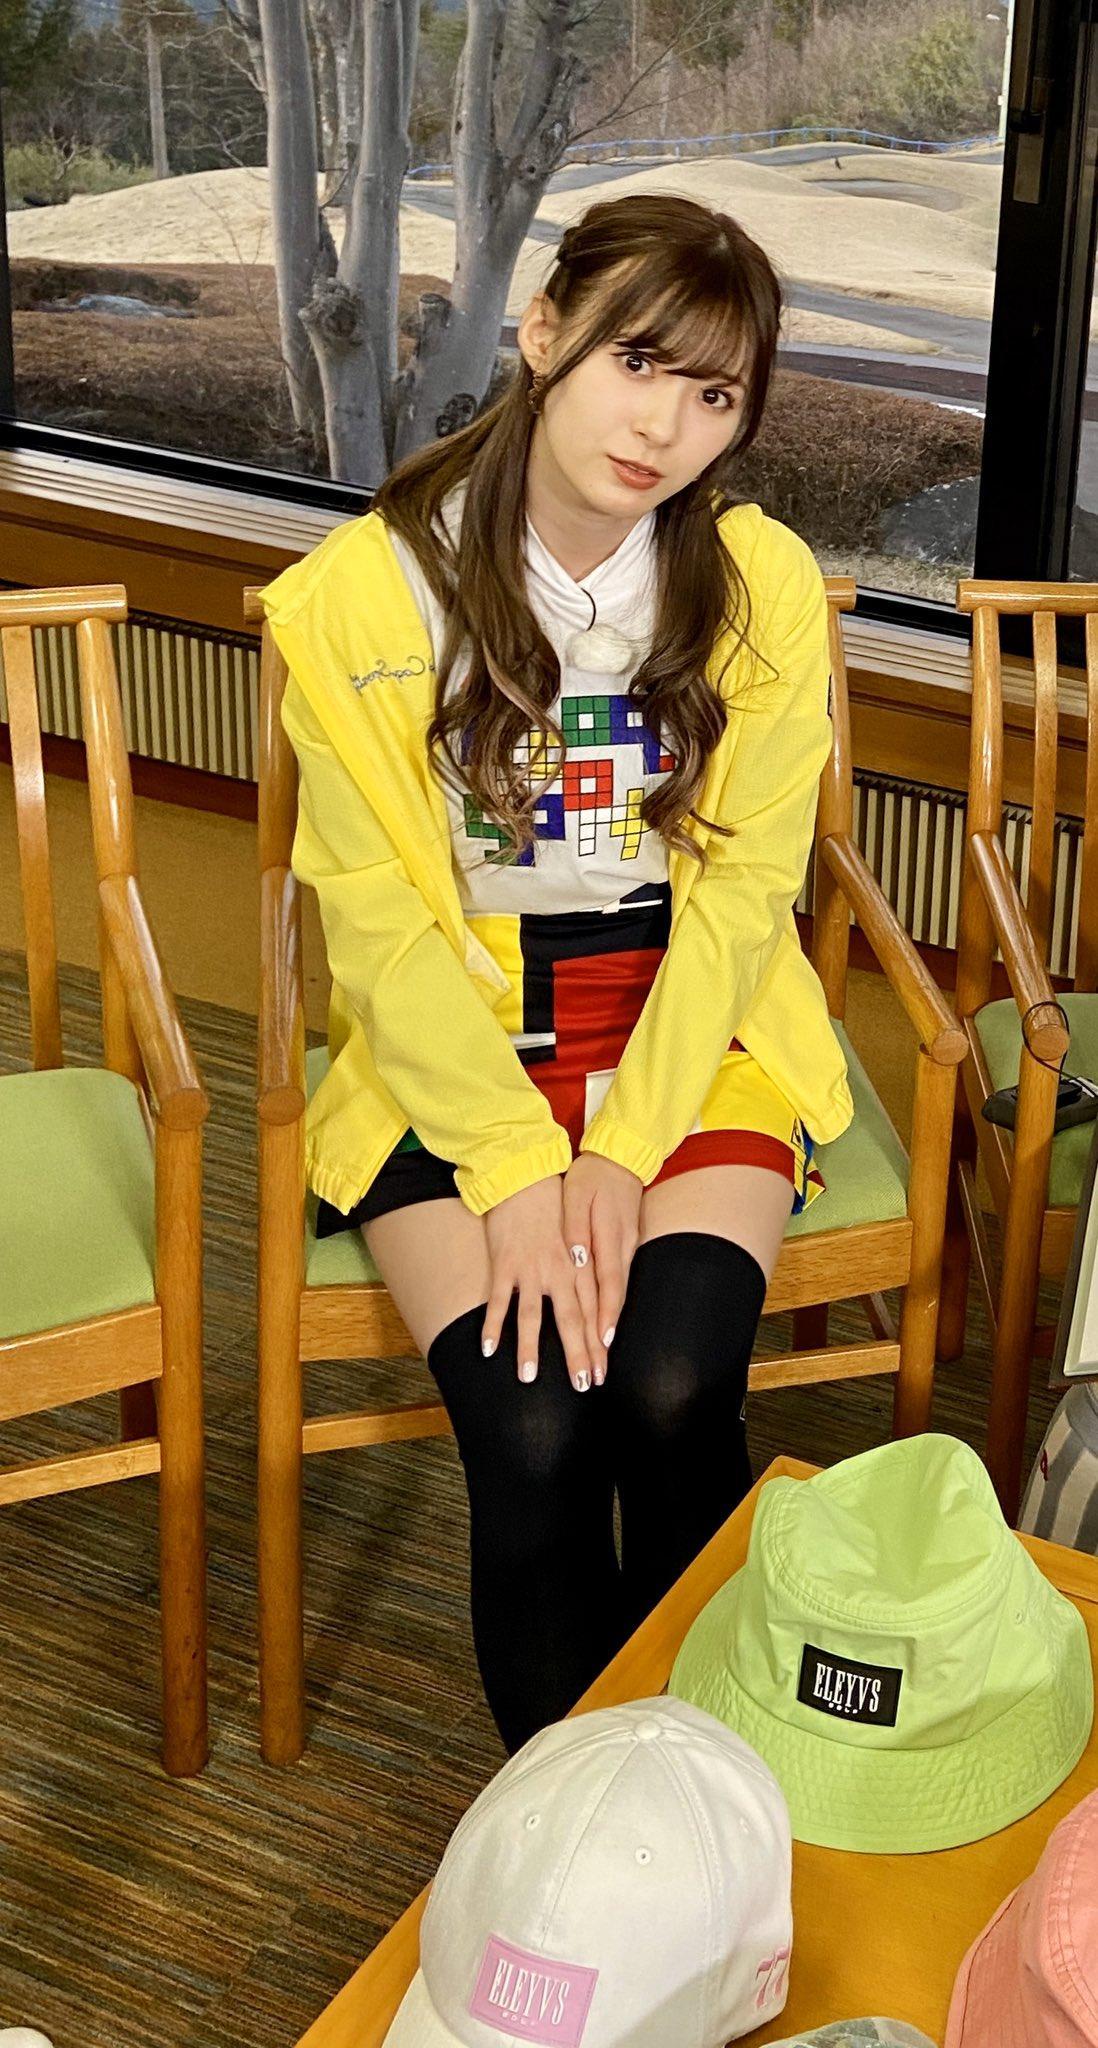 http://www.mybitchisajunky.com/whg/picture/orig%23EXbJOSgUEAEQWqc.jpg